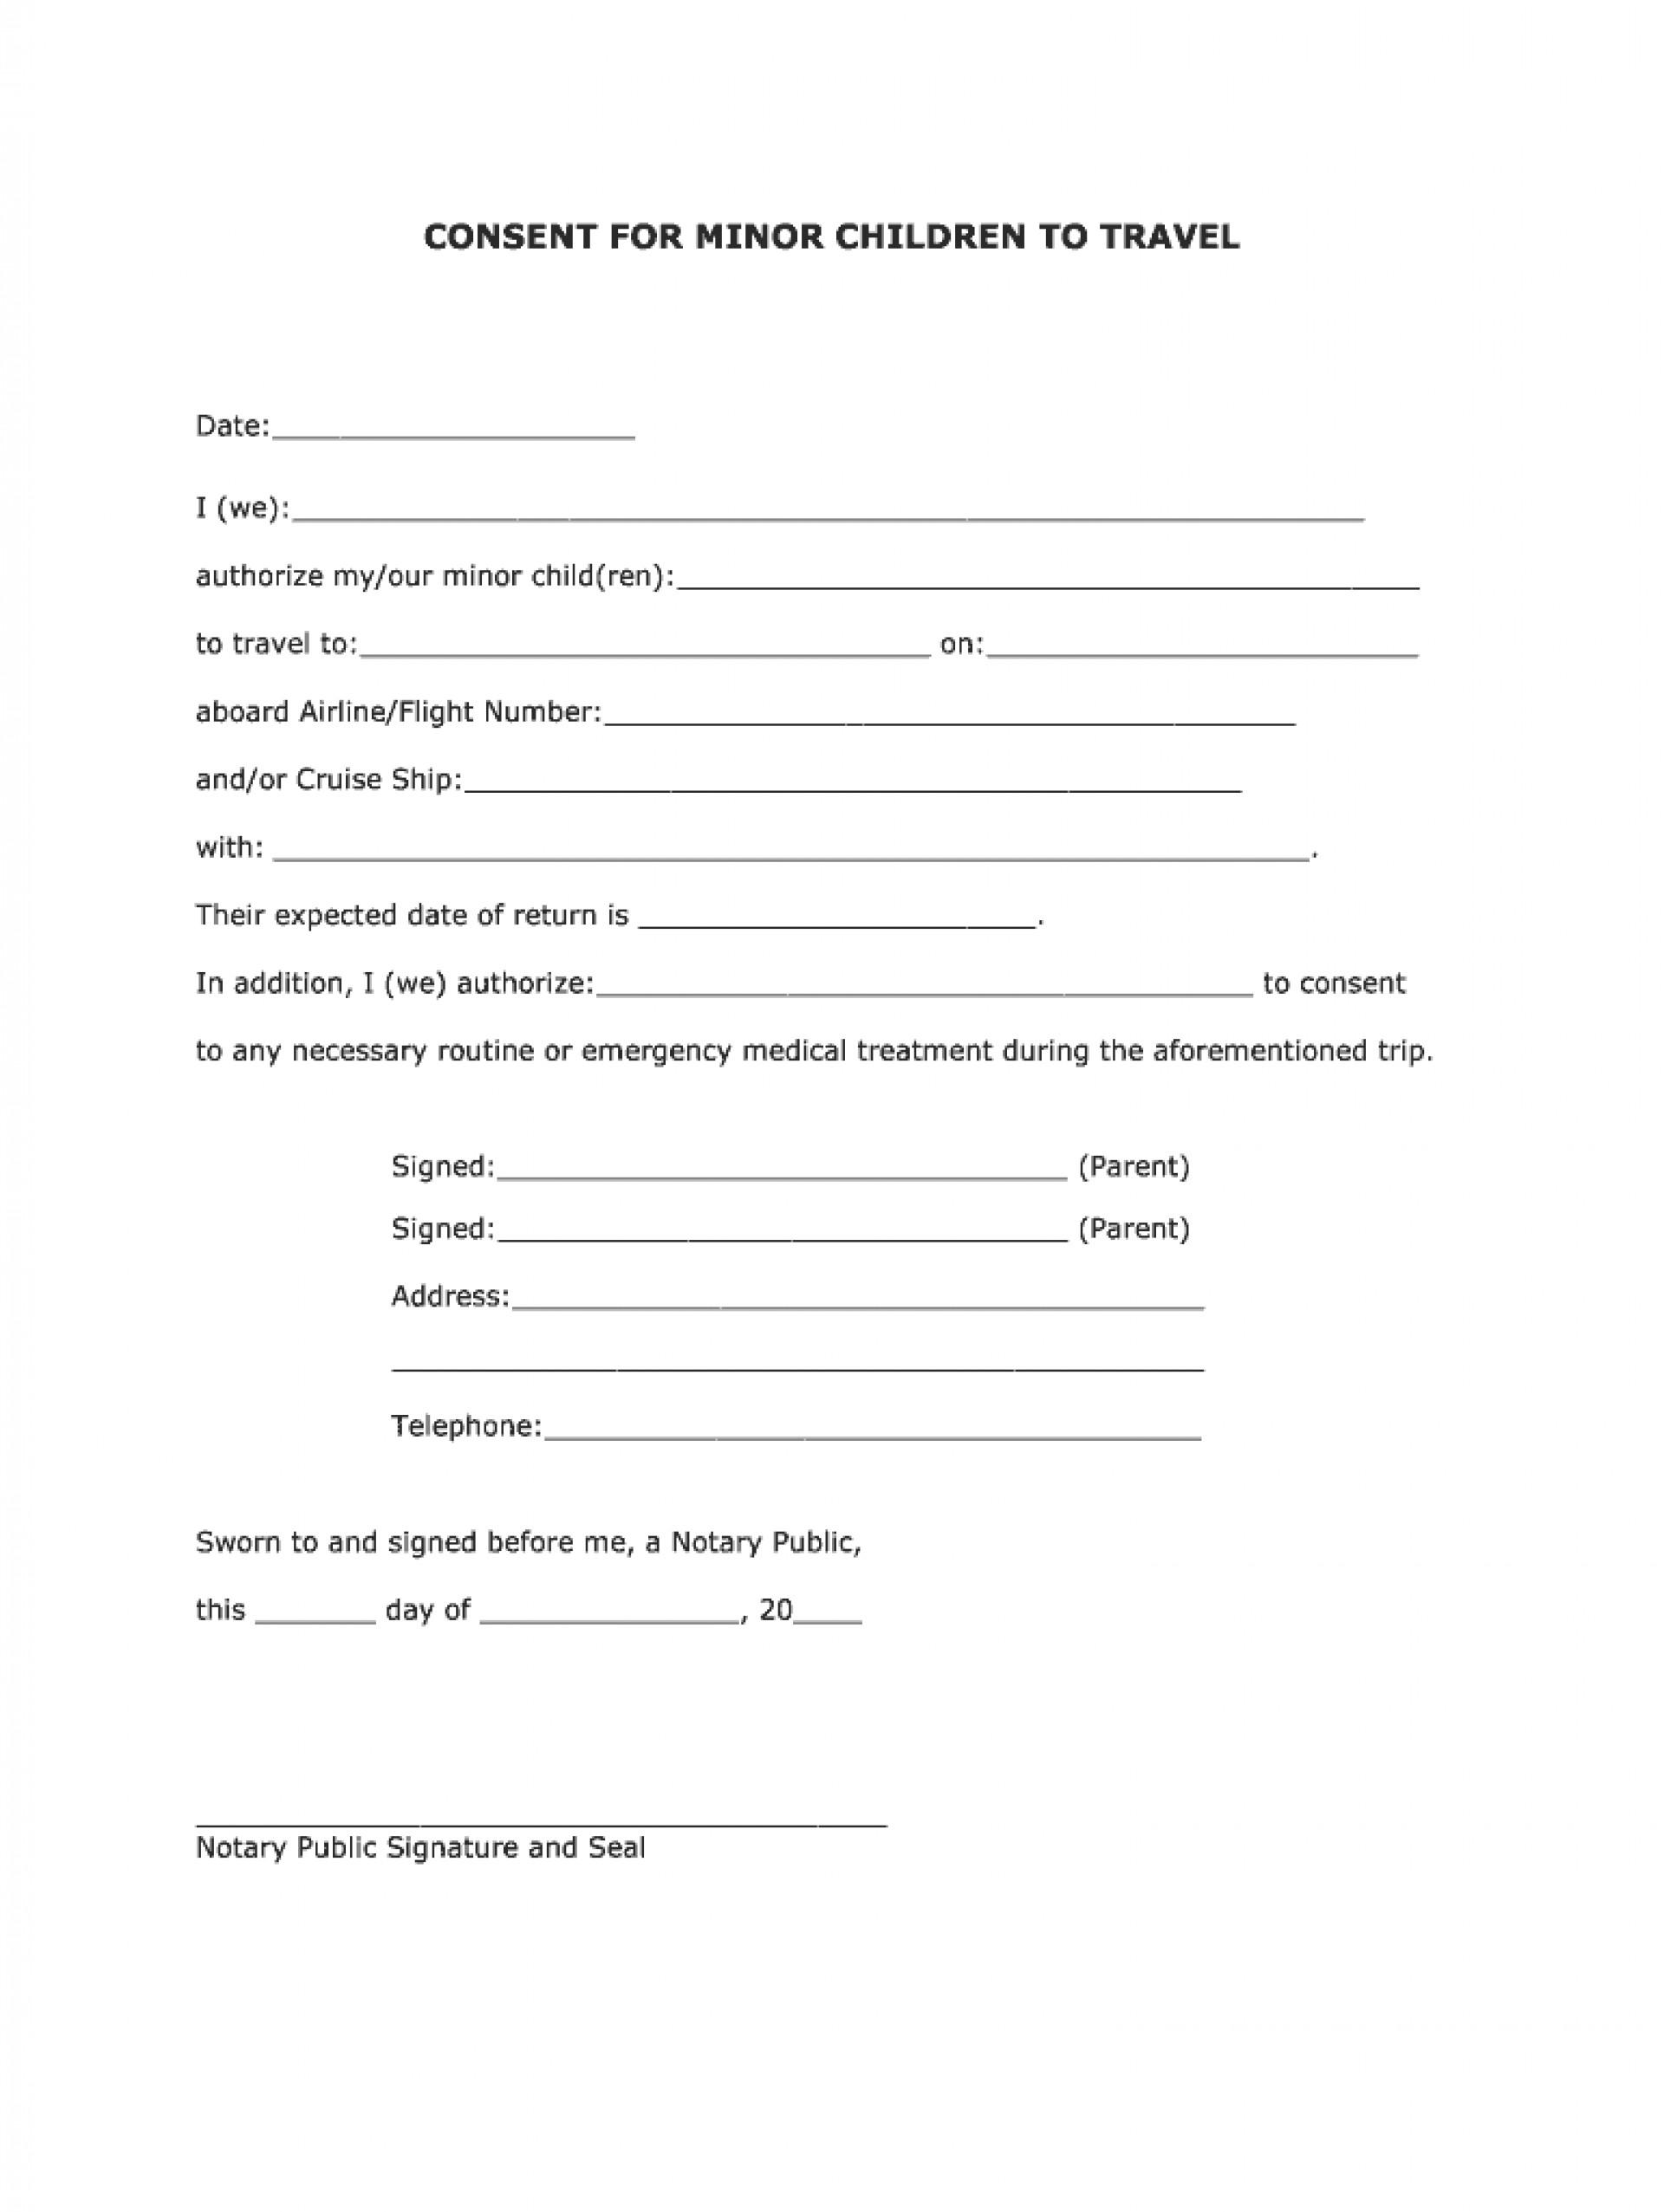 Parental Consent Free Child Travel Consent Form Template Pdf